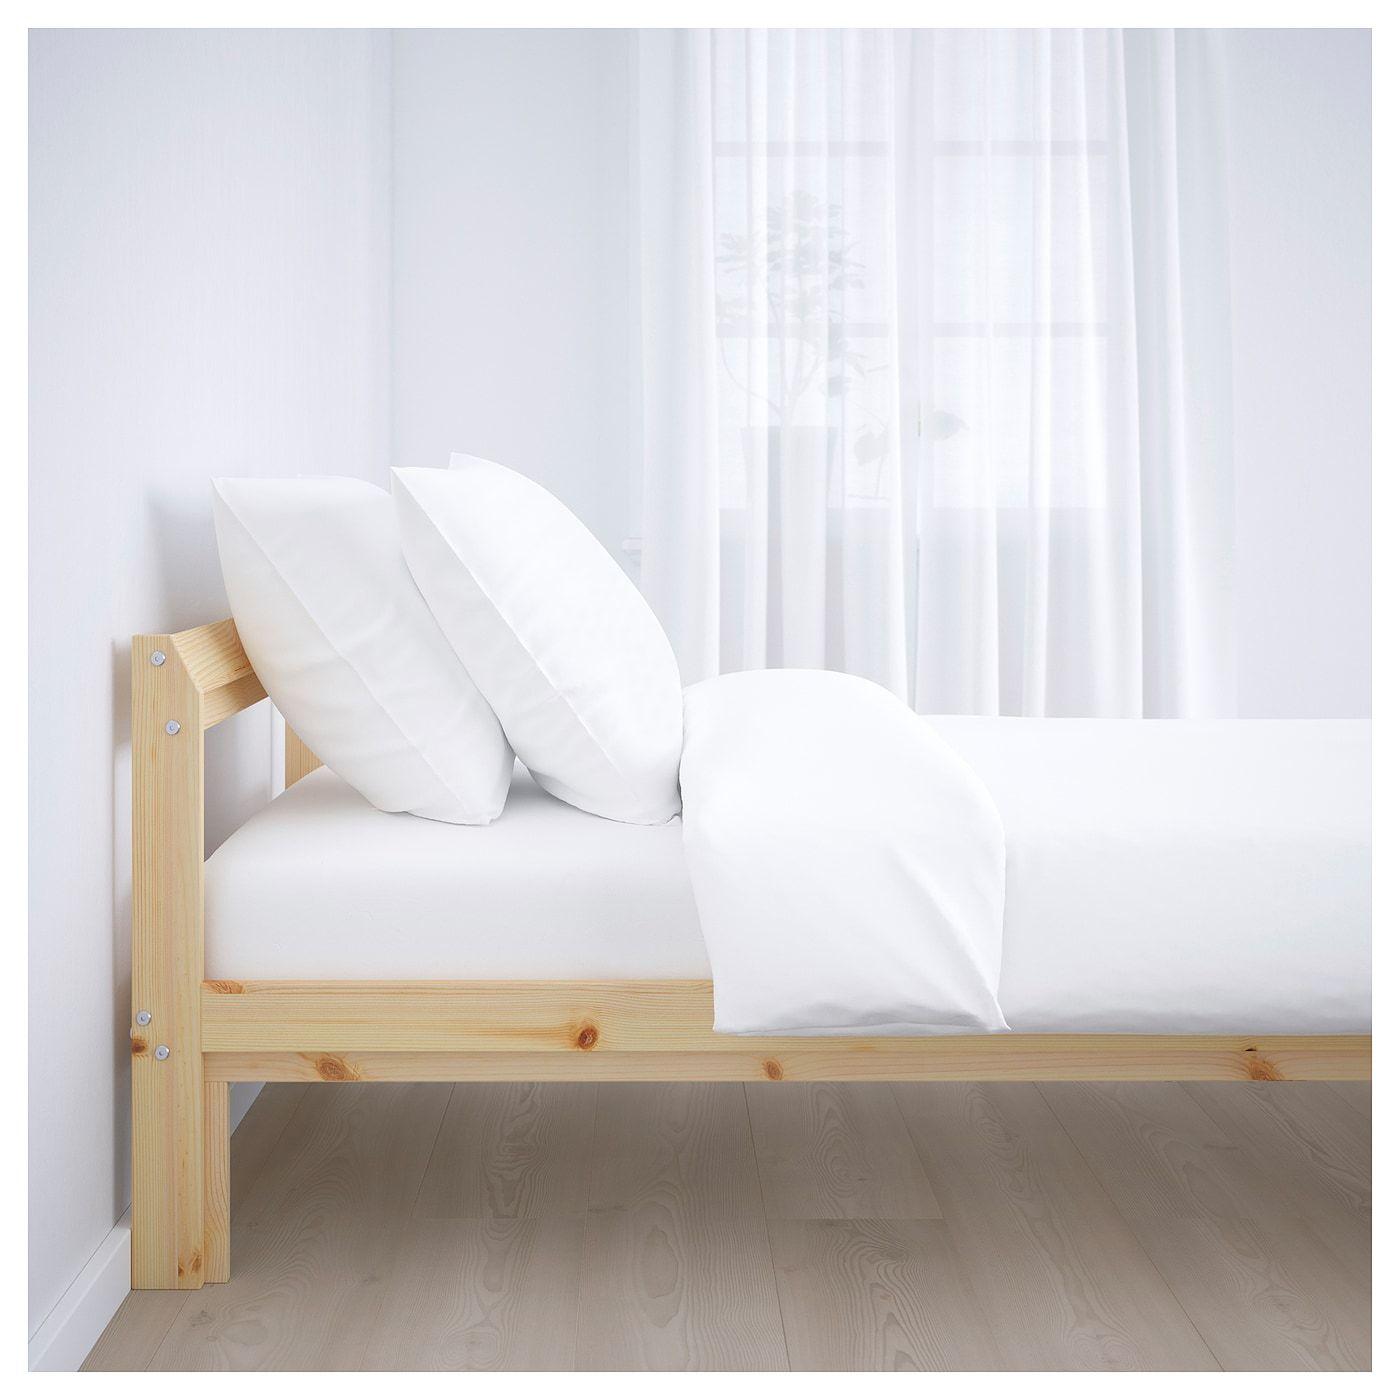 Neiden Bedframe Grenen 90x200 Cm Ikea Bed Frame Pine Bed Frame Ikea Bed